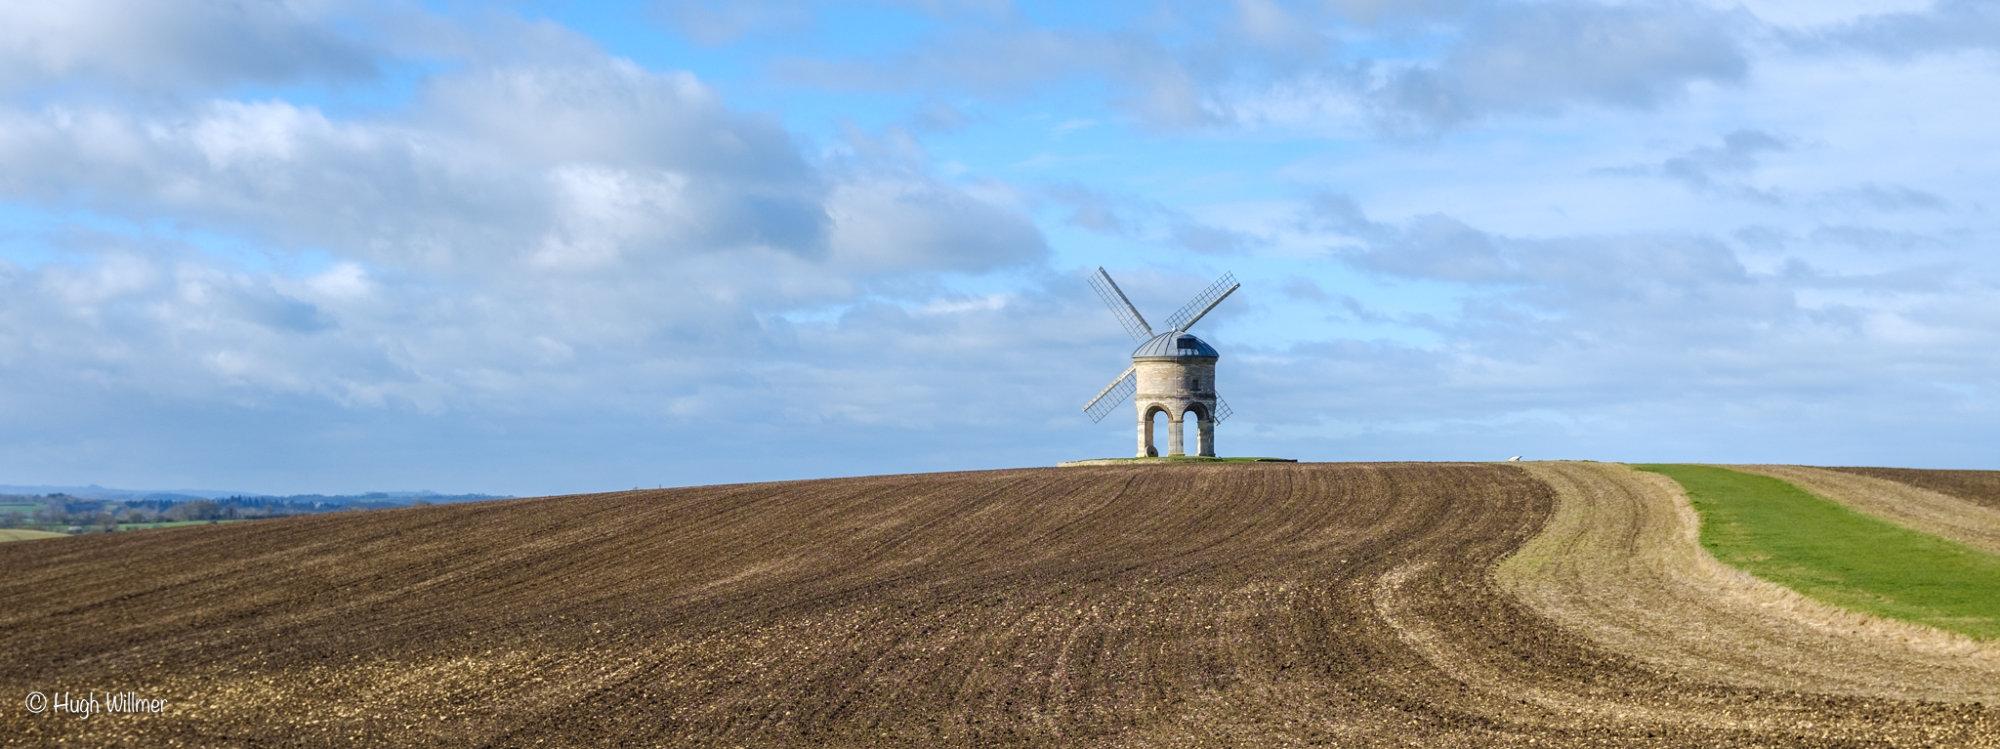 """Chesterton Windmill, Warwickshire"""